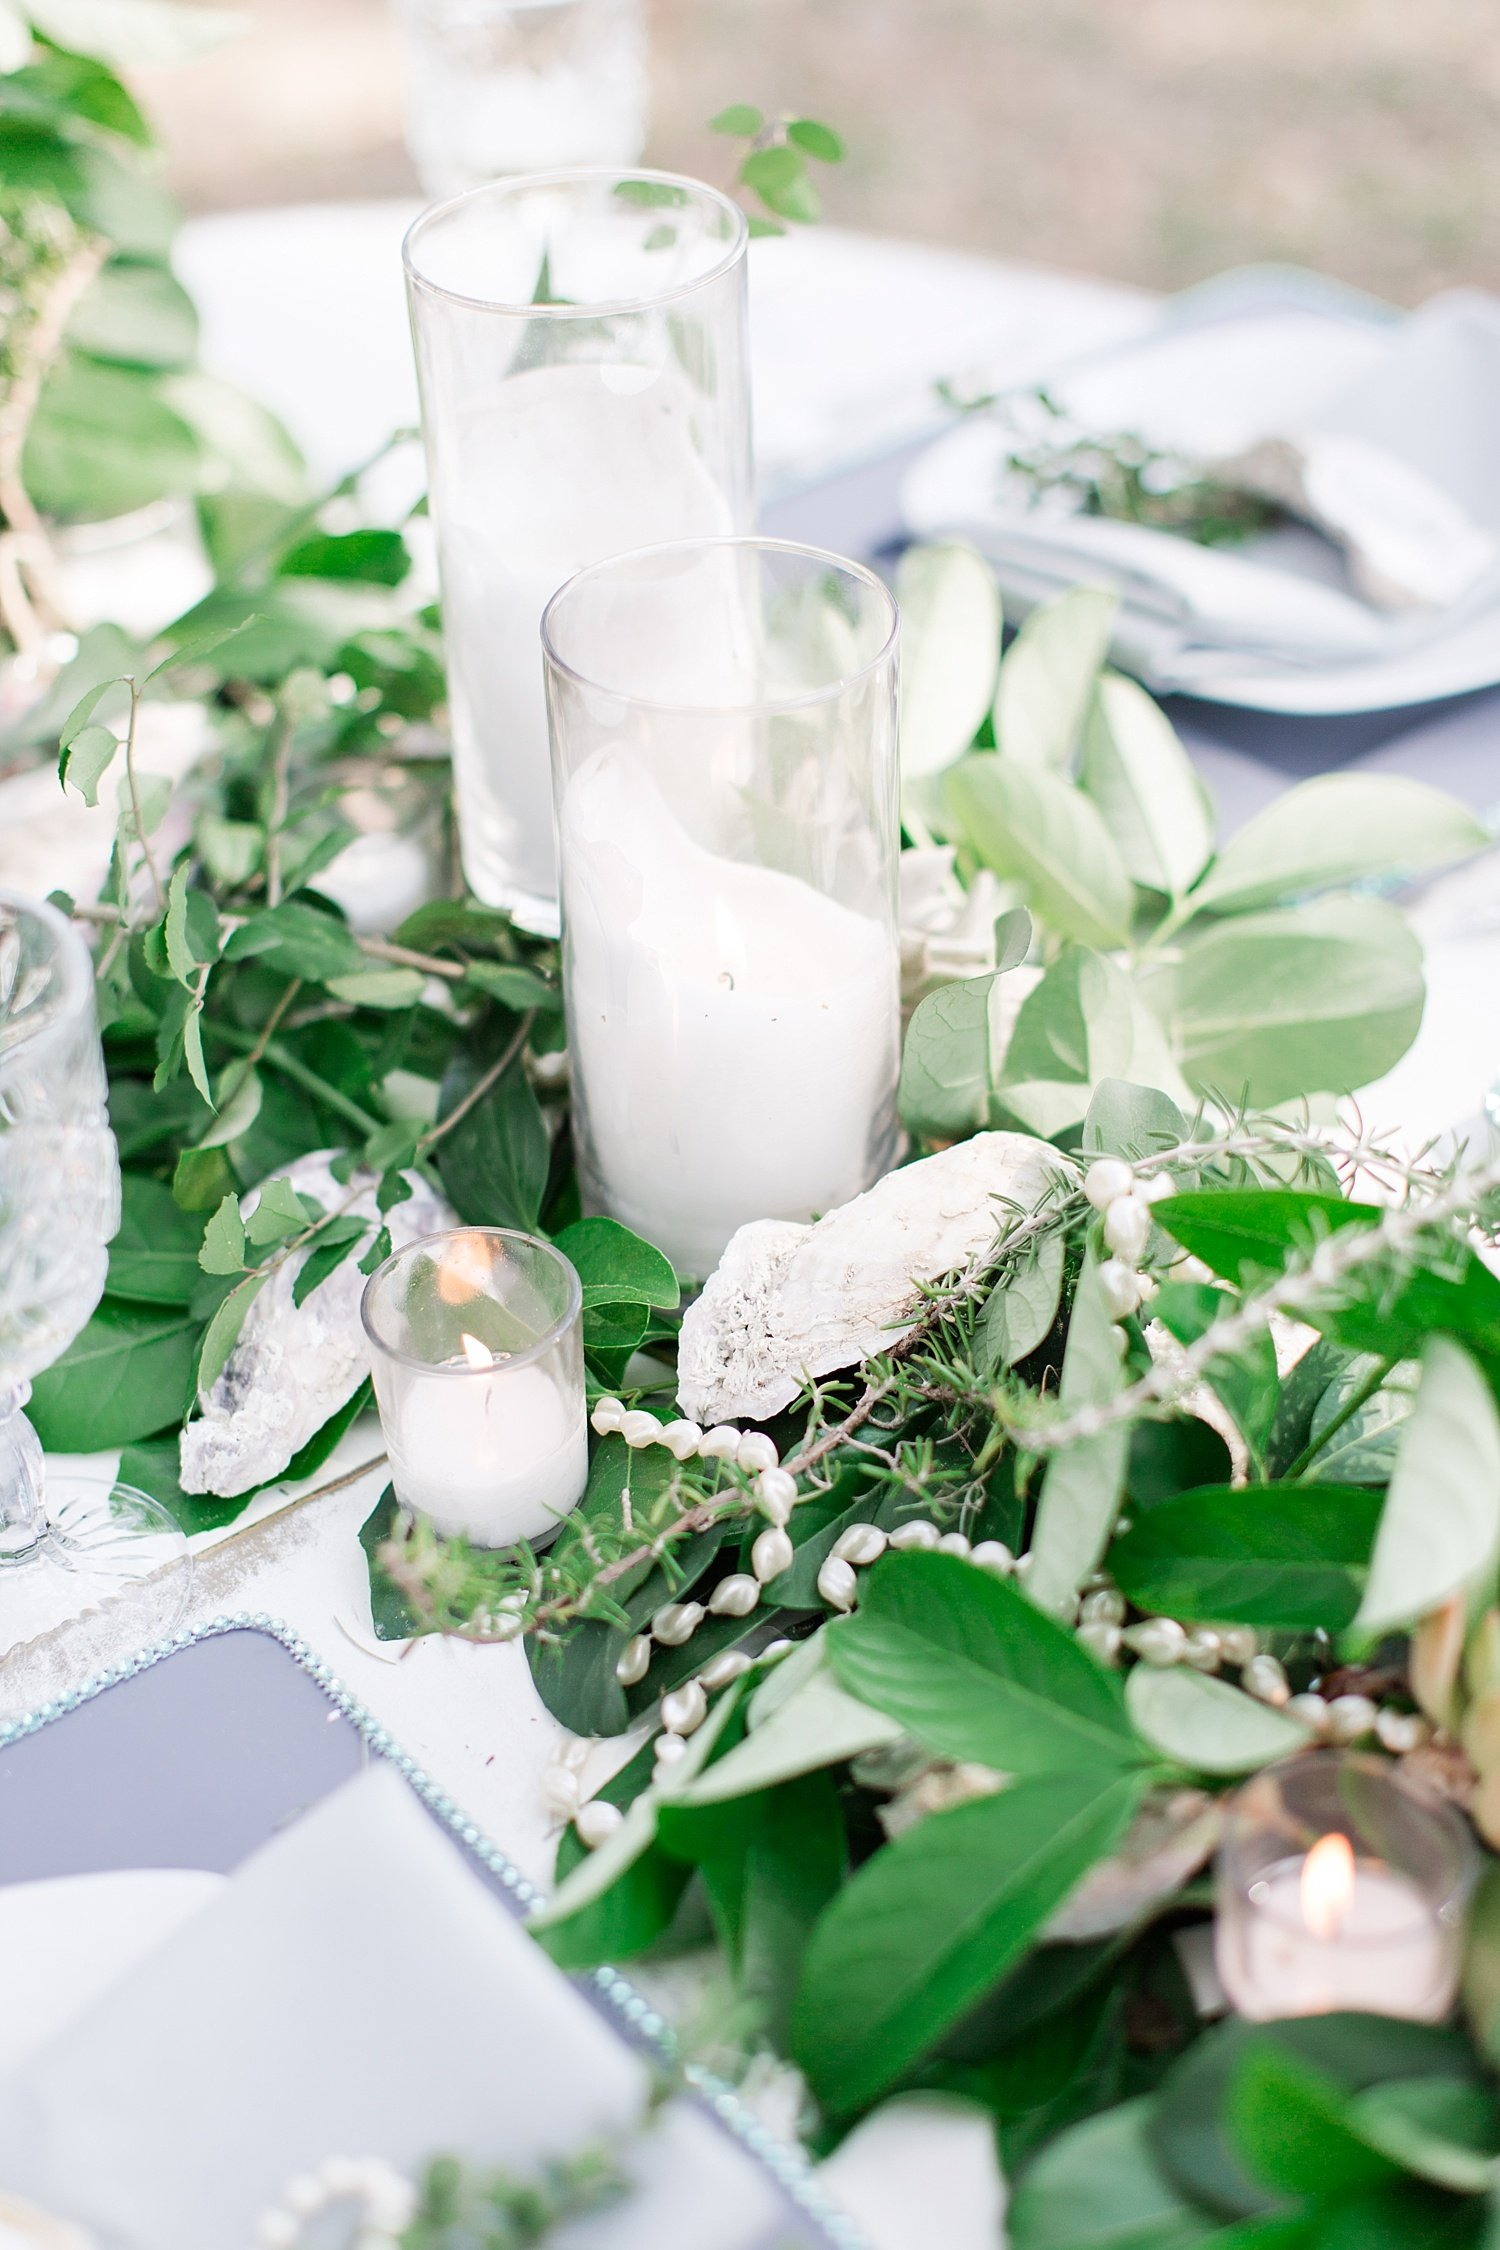 rachel-strickland-photography-katie-may-ivory-and-beau-bridal-boutique-bethesda-academy-wedding-whitfield-chapel-wedding-savannah-bridal-boutique-savannah-weddings-savannah-wedding-savannah-wedding-planner-savannah-bridal-gowns-savannah-bride-19.jpg